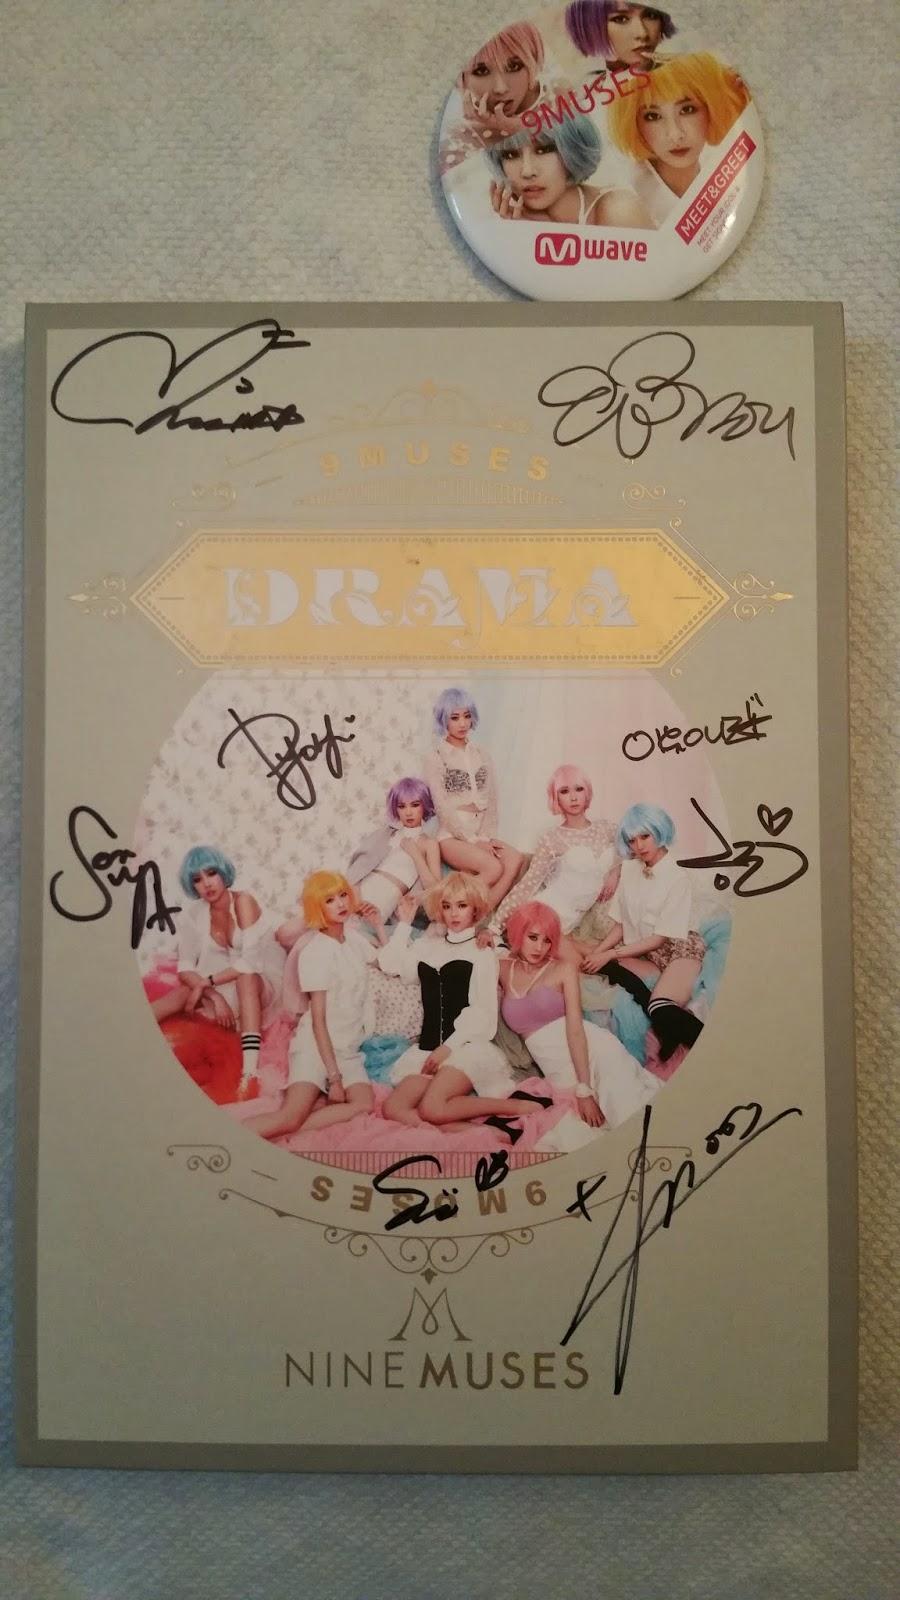 Signed nine muses drama cd from mwave meet greet ticket one way signed nine muses drama cd from mwave meet greet m4hsunfo